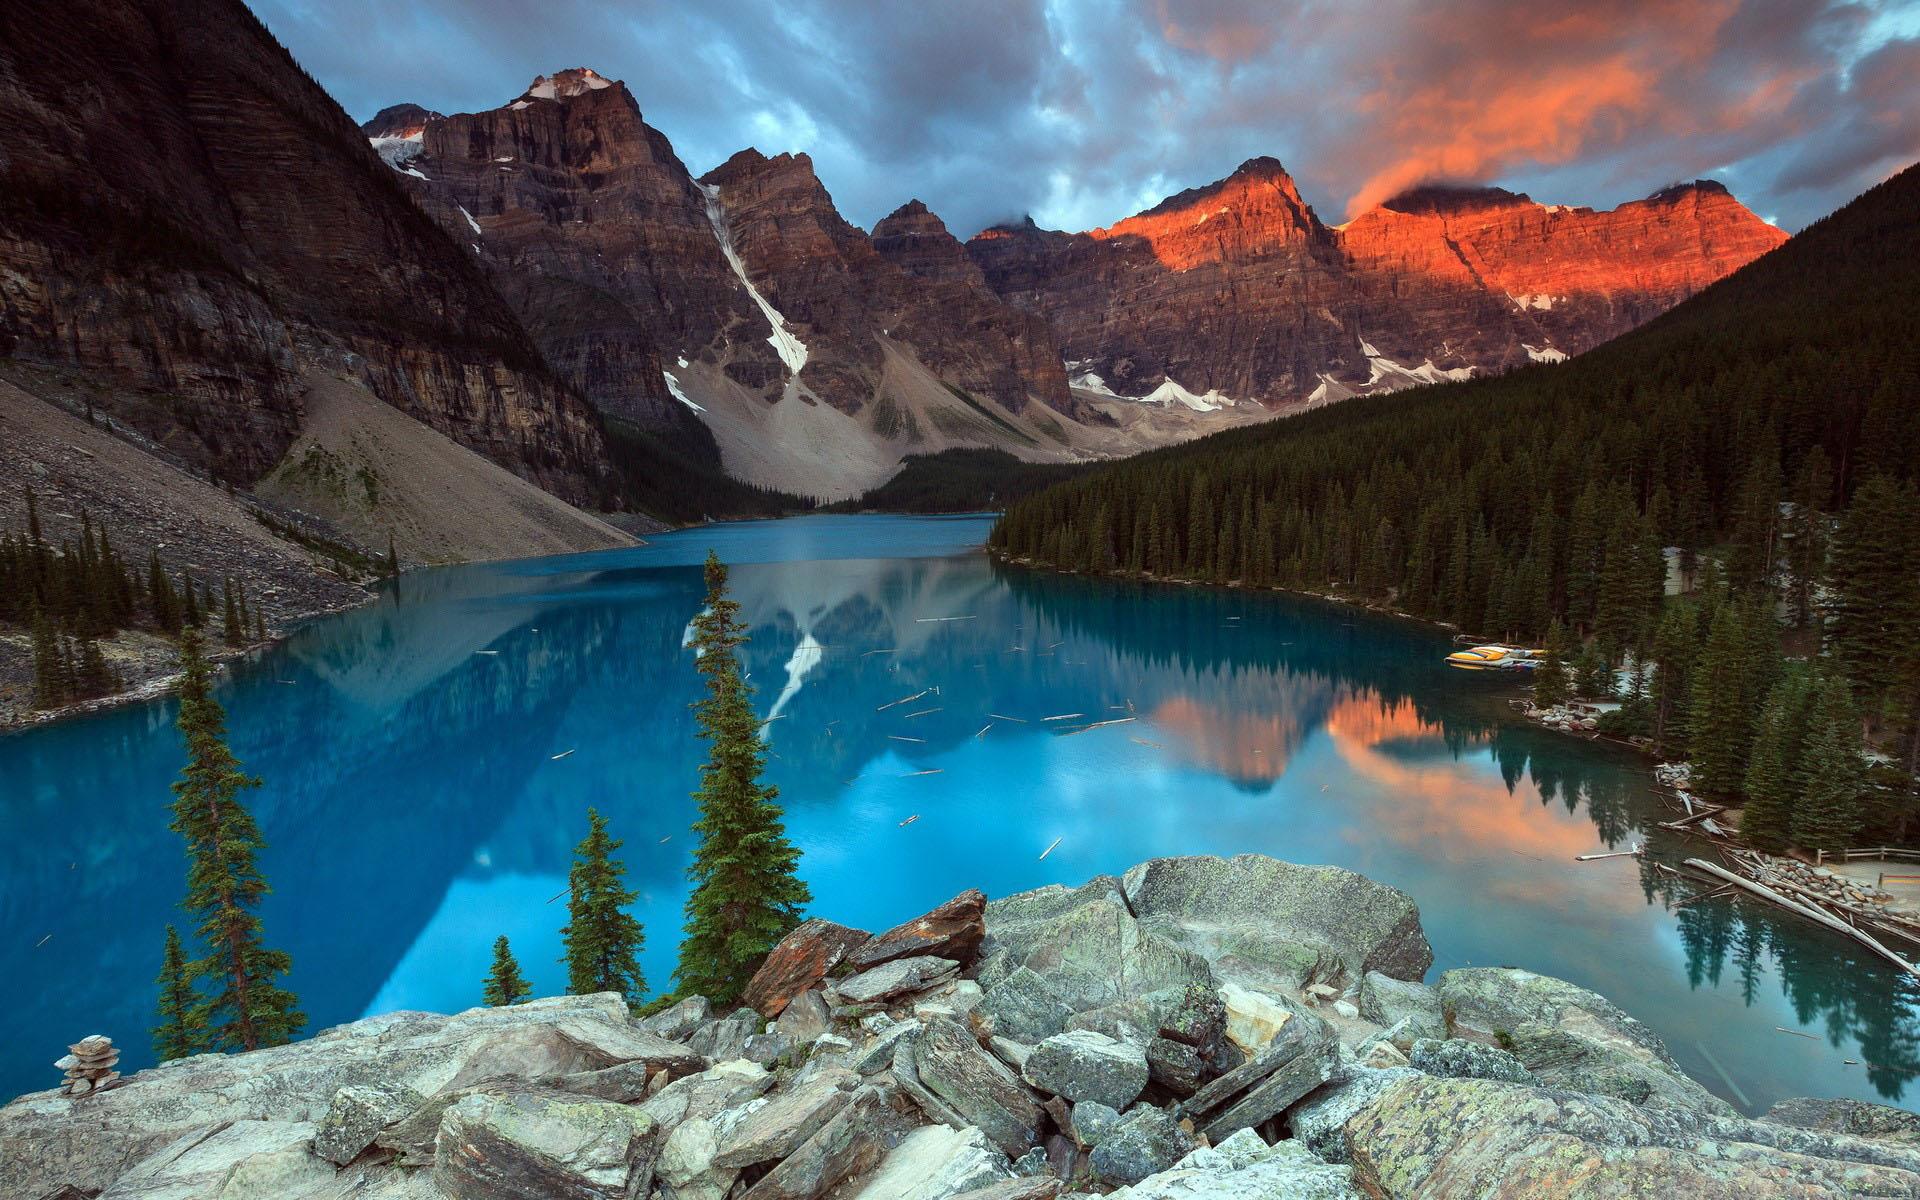 پارک ملی بنف کانادا,دیدنی های پارک ملی بنف کانادا,کانادا,پارک زیبای ملی بنف کانادا,طبیعت کانادا,پارک ملی بنف